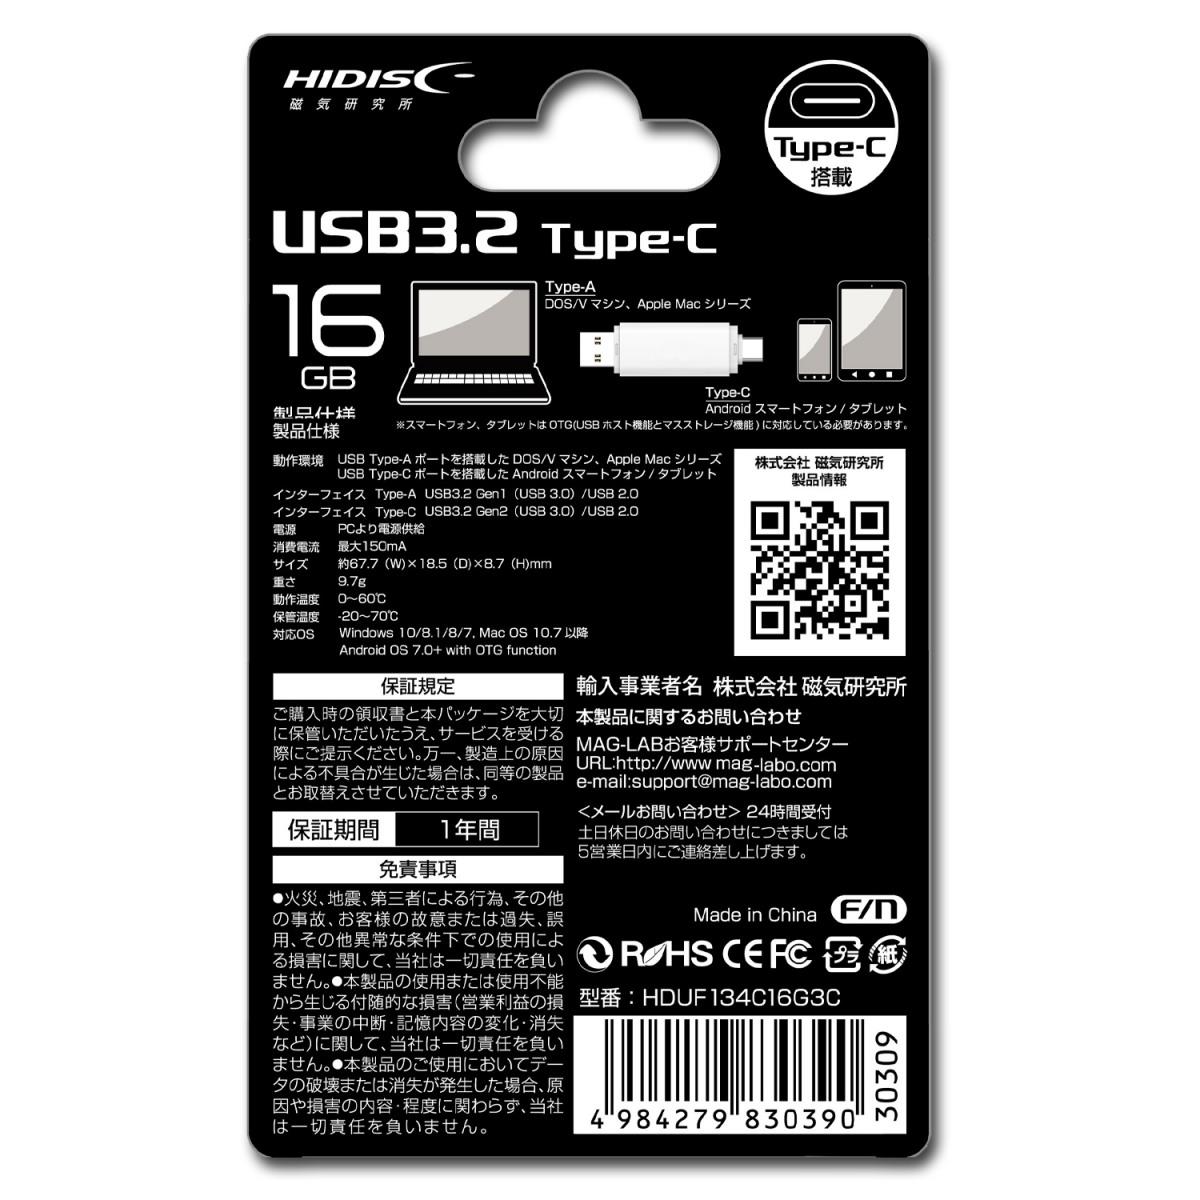 HIDISC USB3.2 Gen2 Type-C メモリ Type-Aコネクタ搭載 HDUF134C16G3C